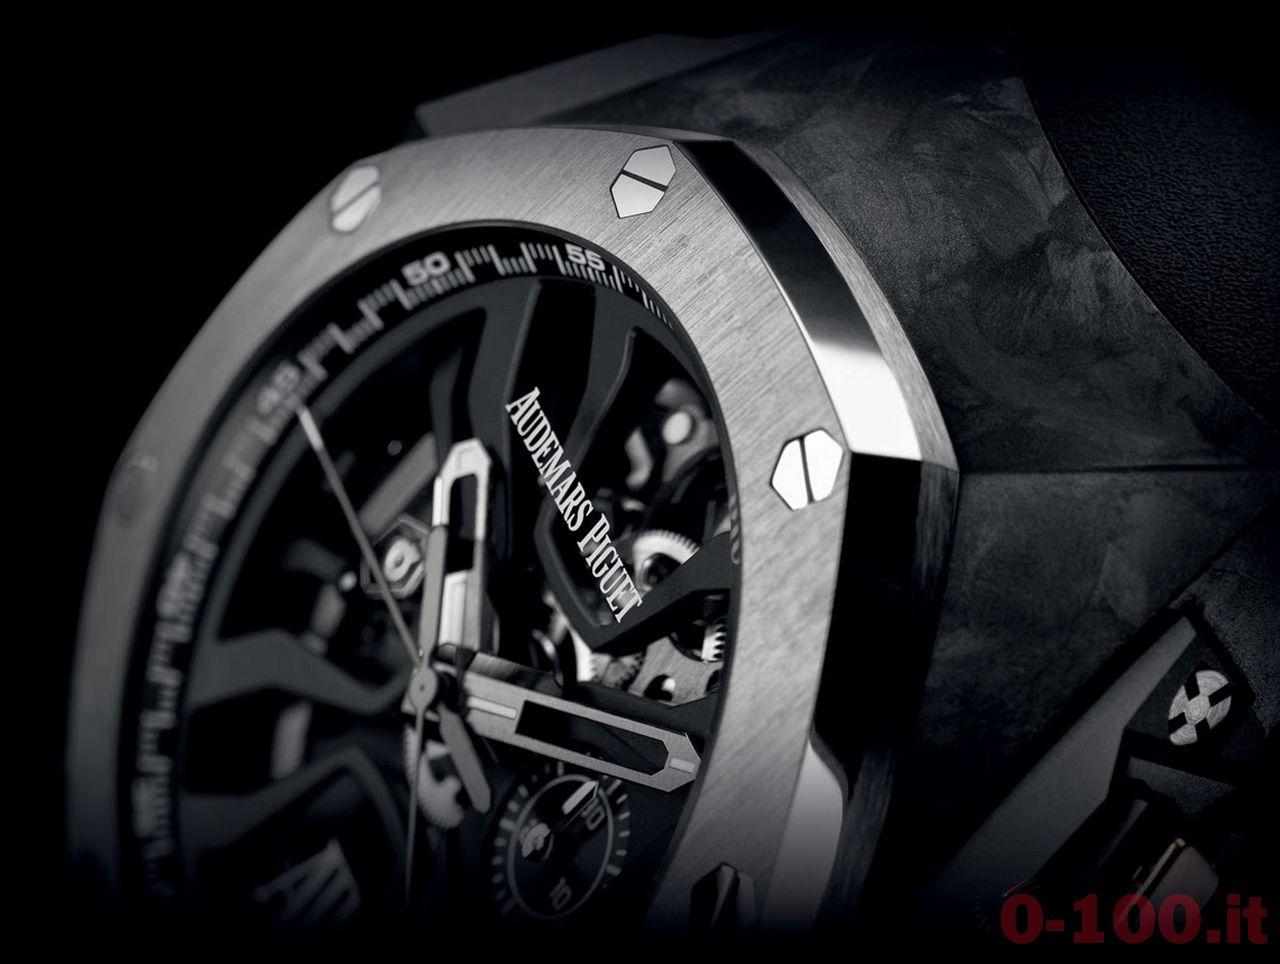 audemars-piguet-royal-oak-concept-laptimer-michael-schumacher-limited-edition-ref-26221ft-oo-d002ca-01_0-10011